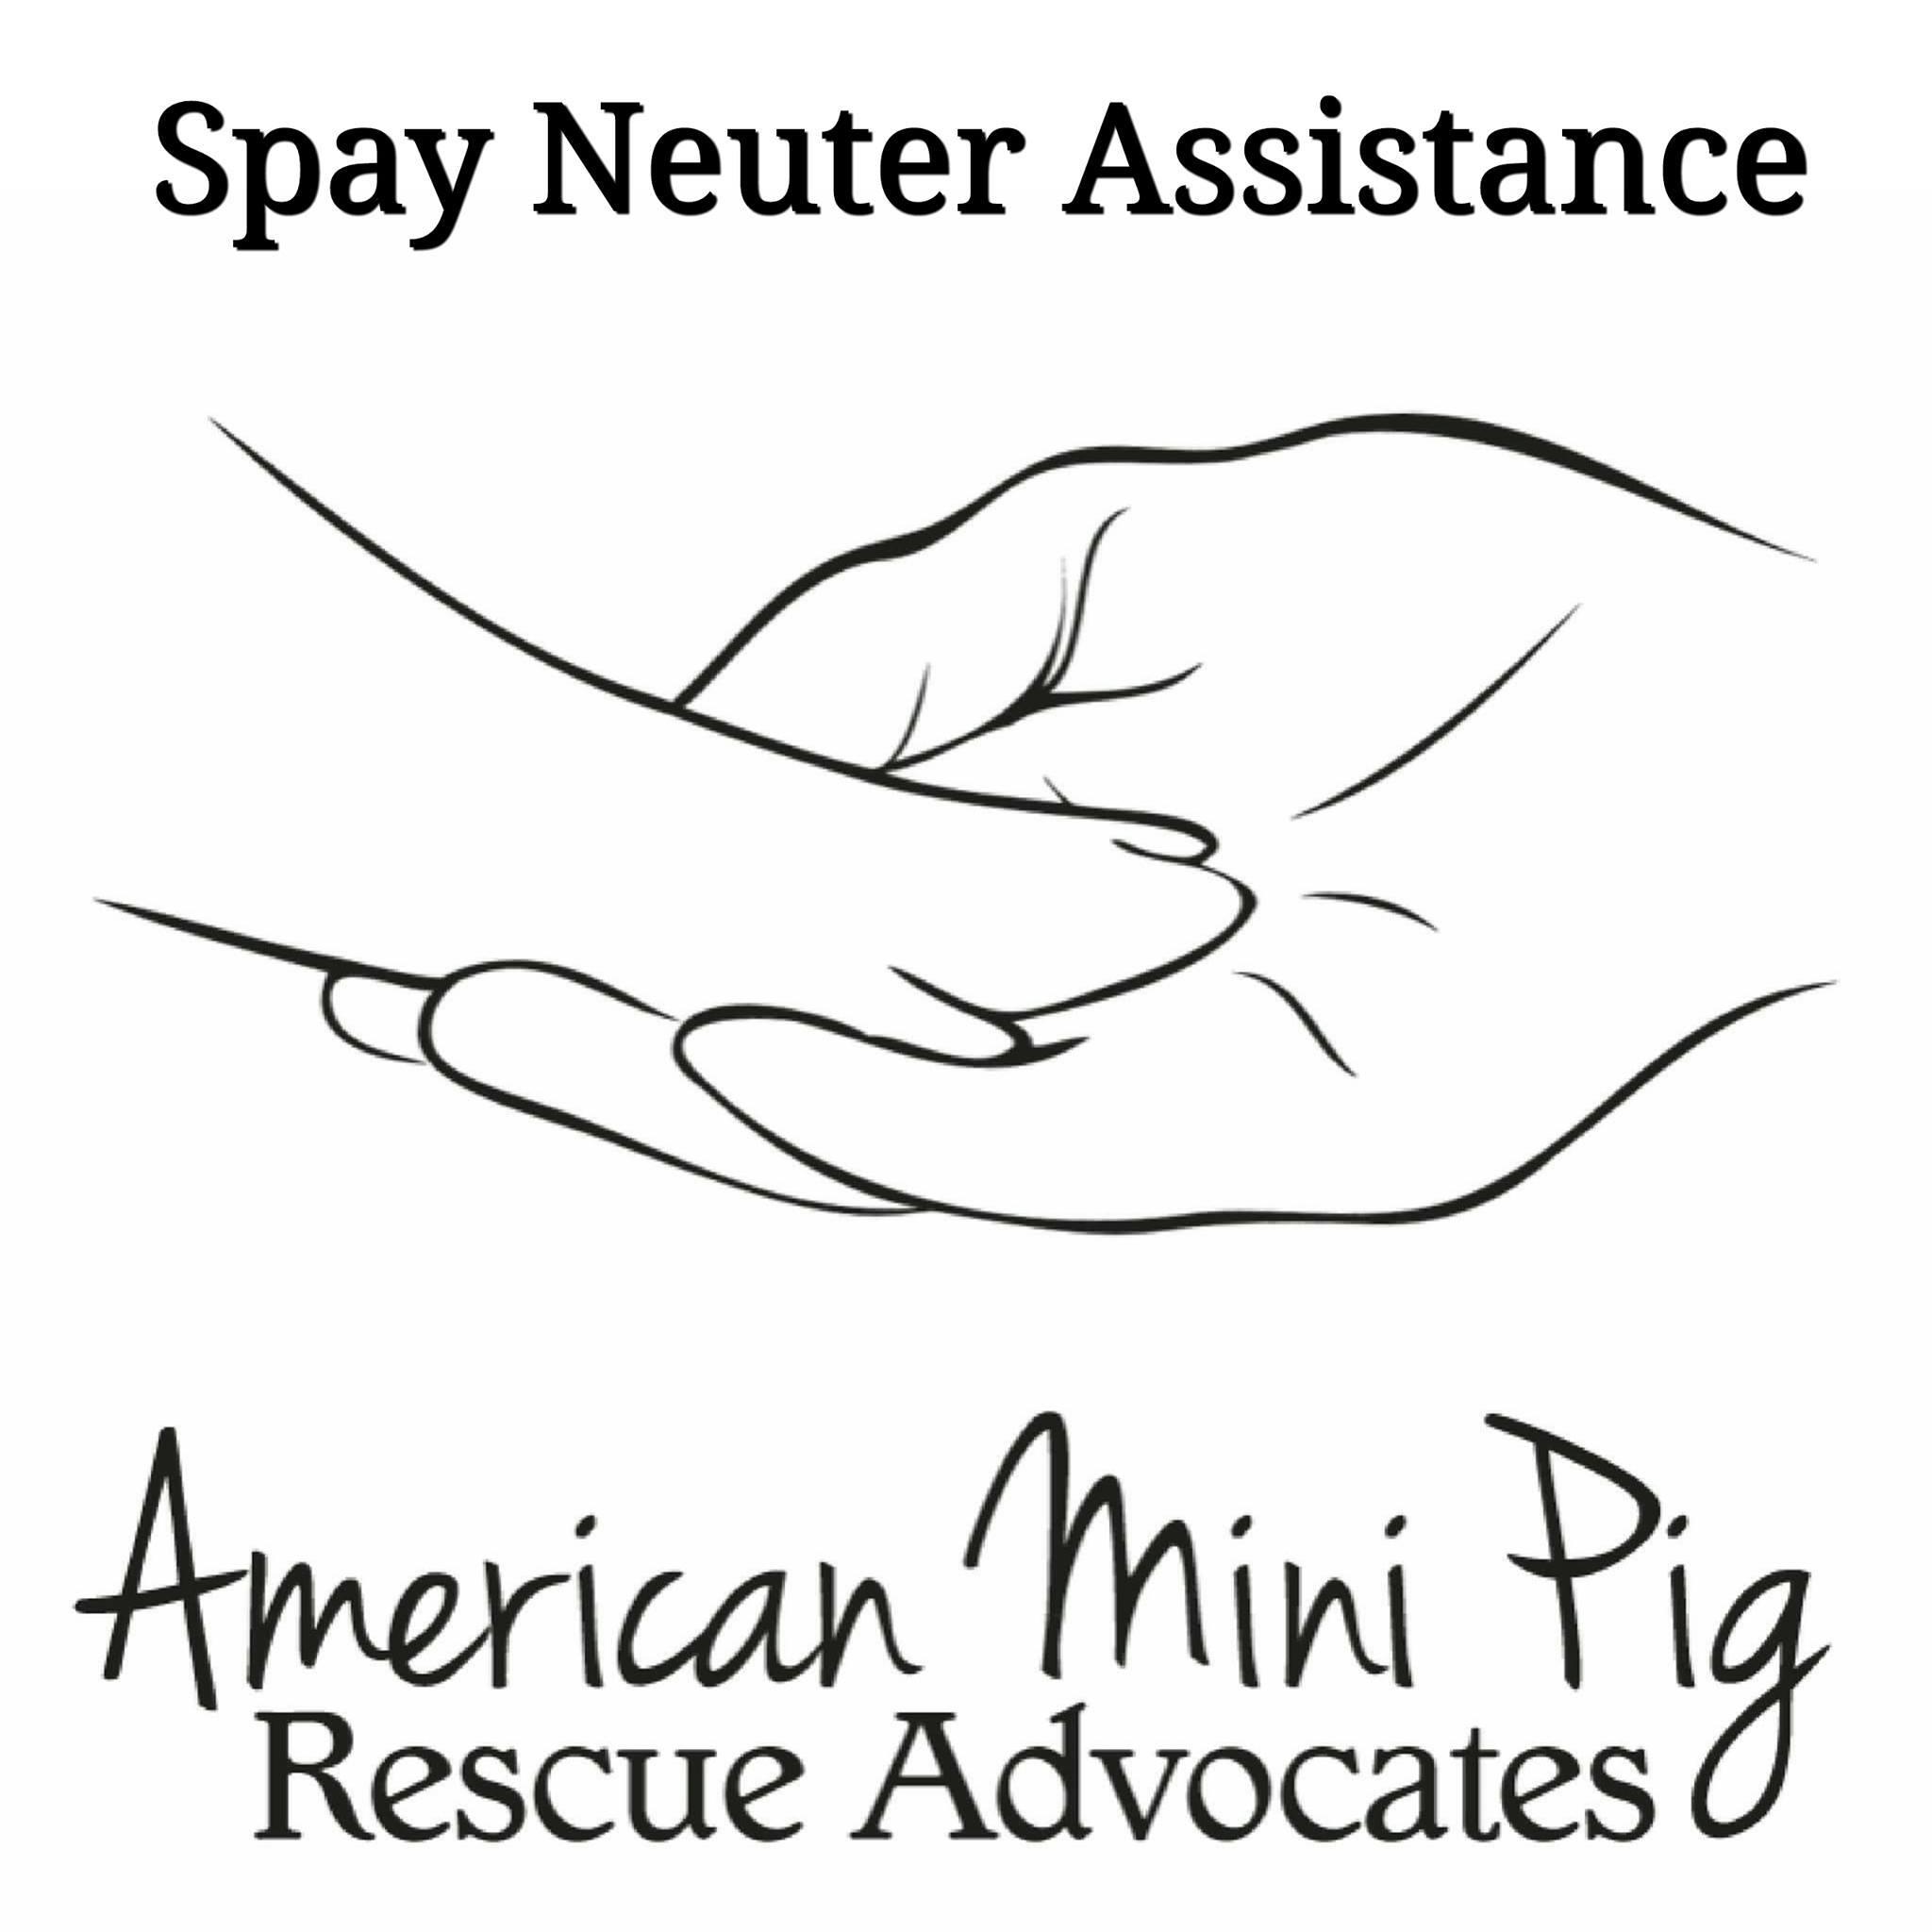 mini pig neuter assistance